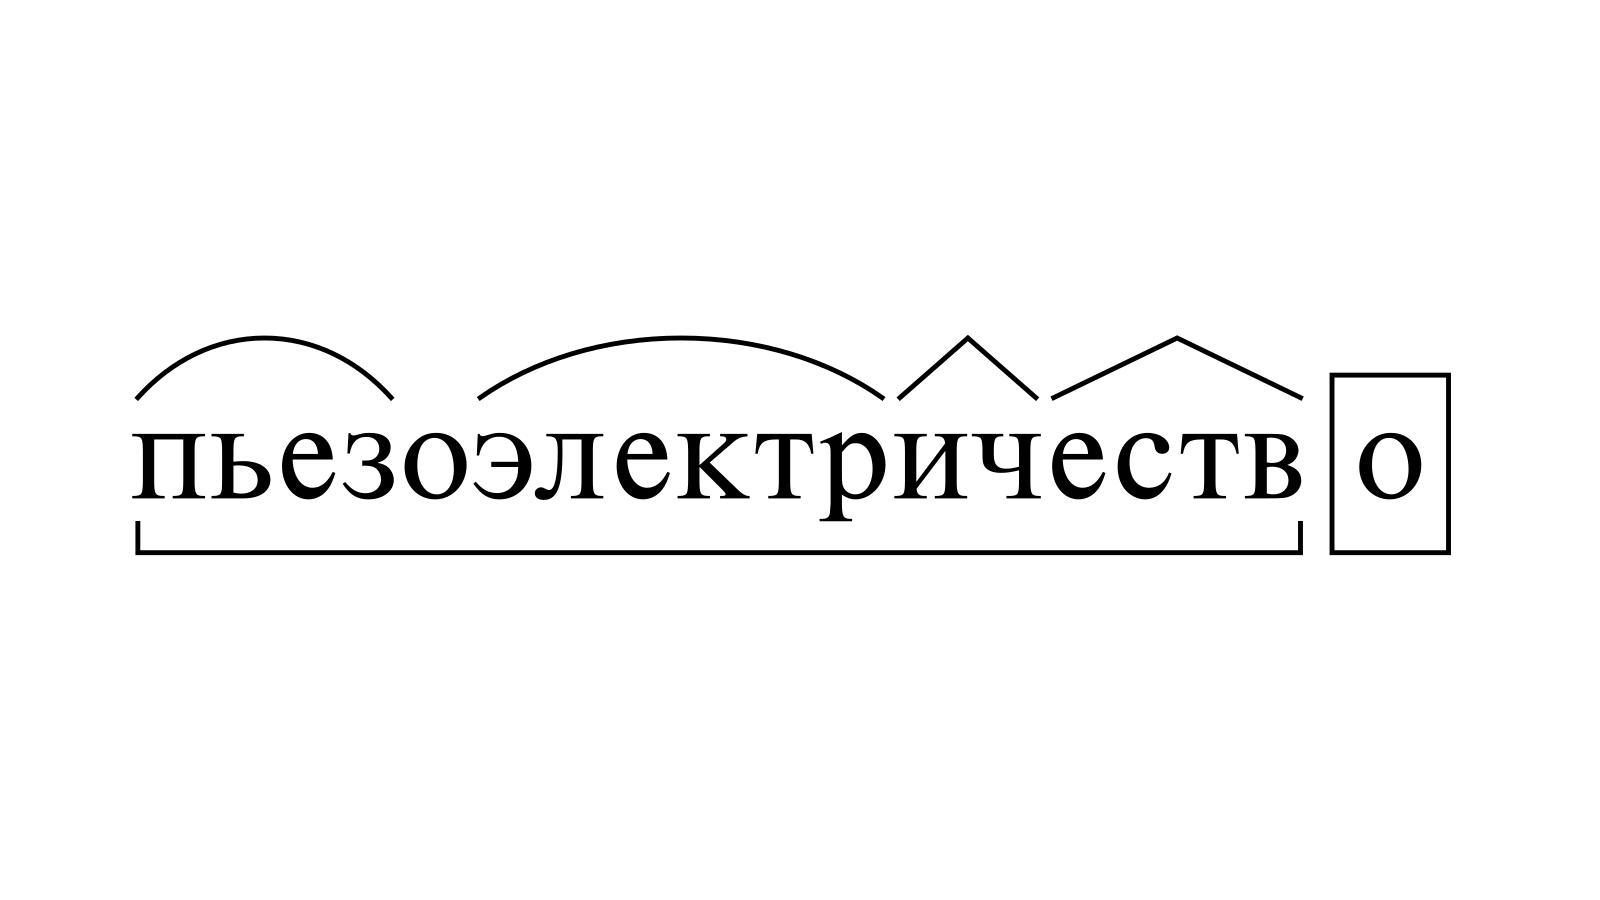 Разбор слова «пьезоэлектричество» по составу